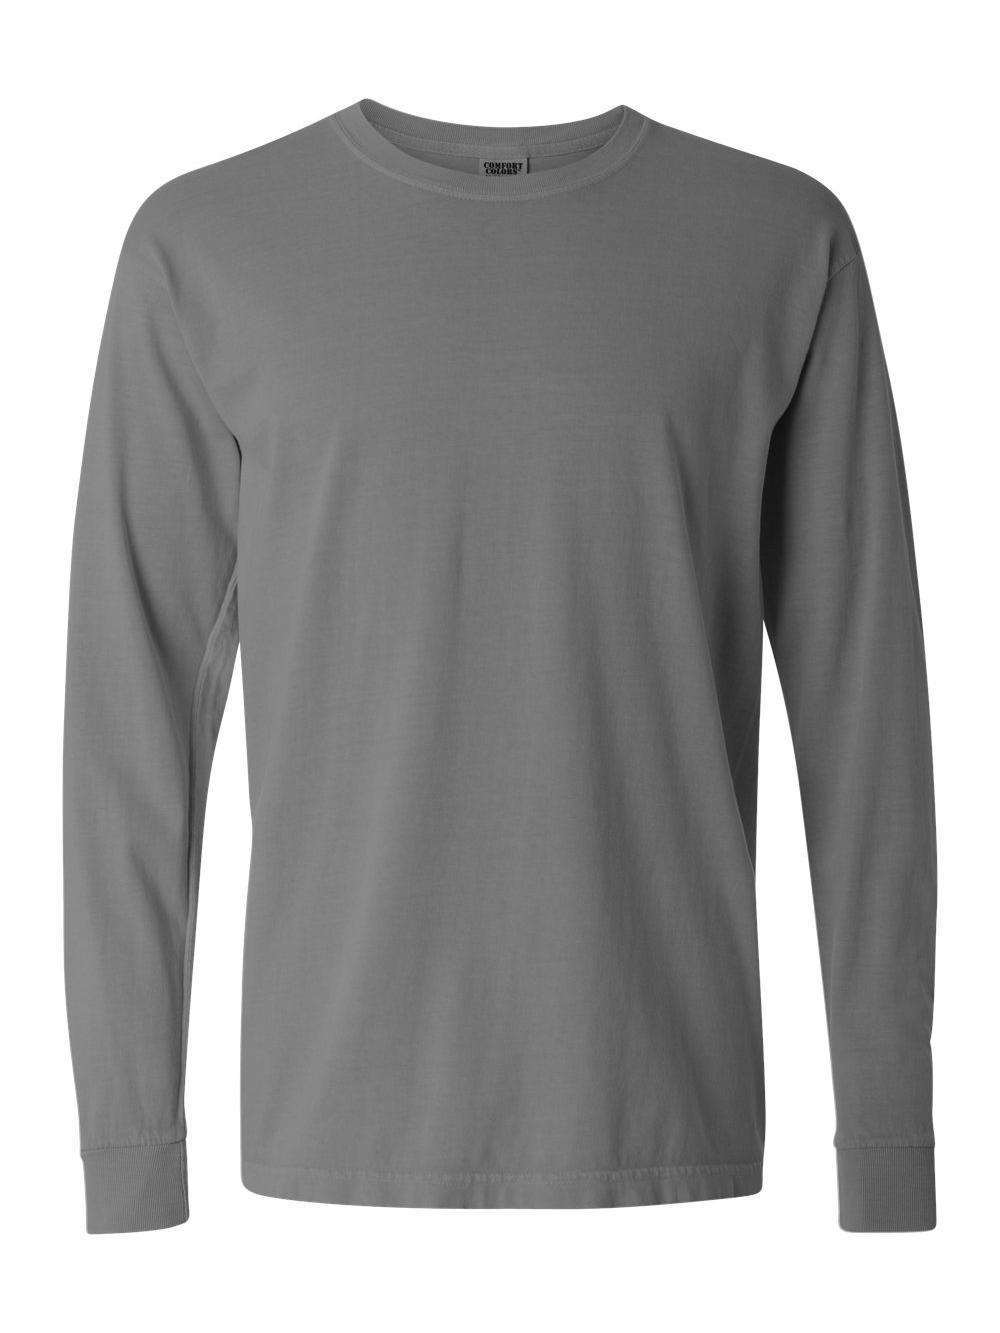 Comfort-Colors-Garment-Dyed-Heavyweight-Ringspun-Long-Sleeve-T-Shirt-6014 thumbnail 36